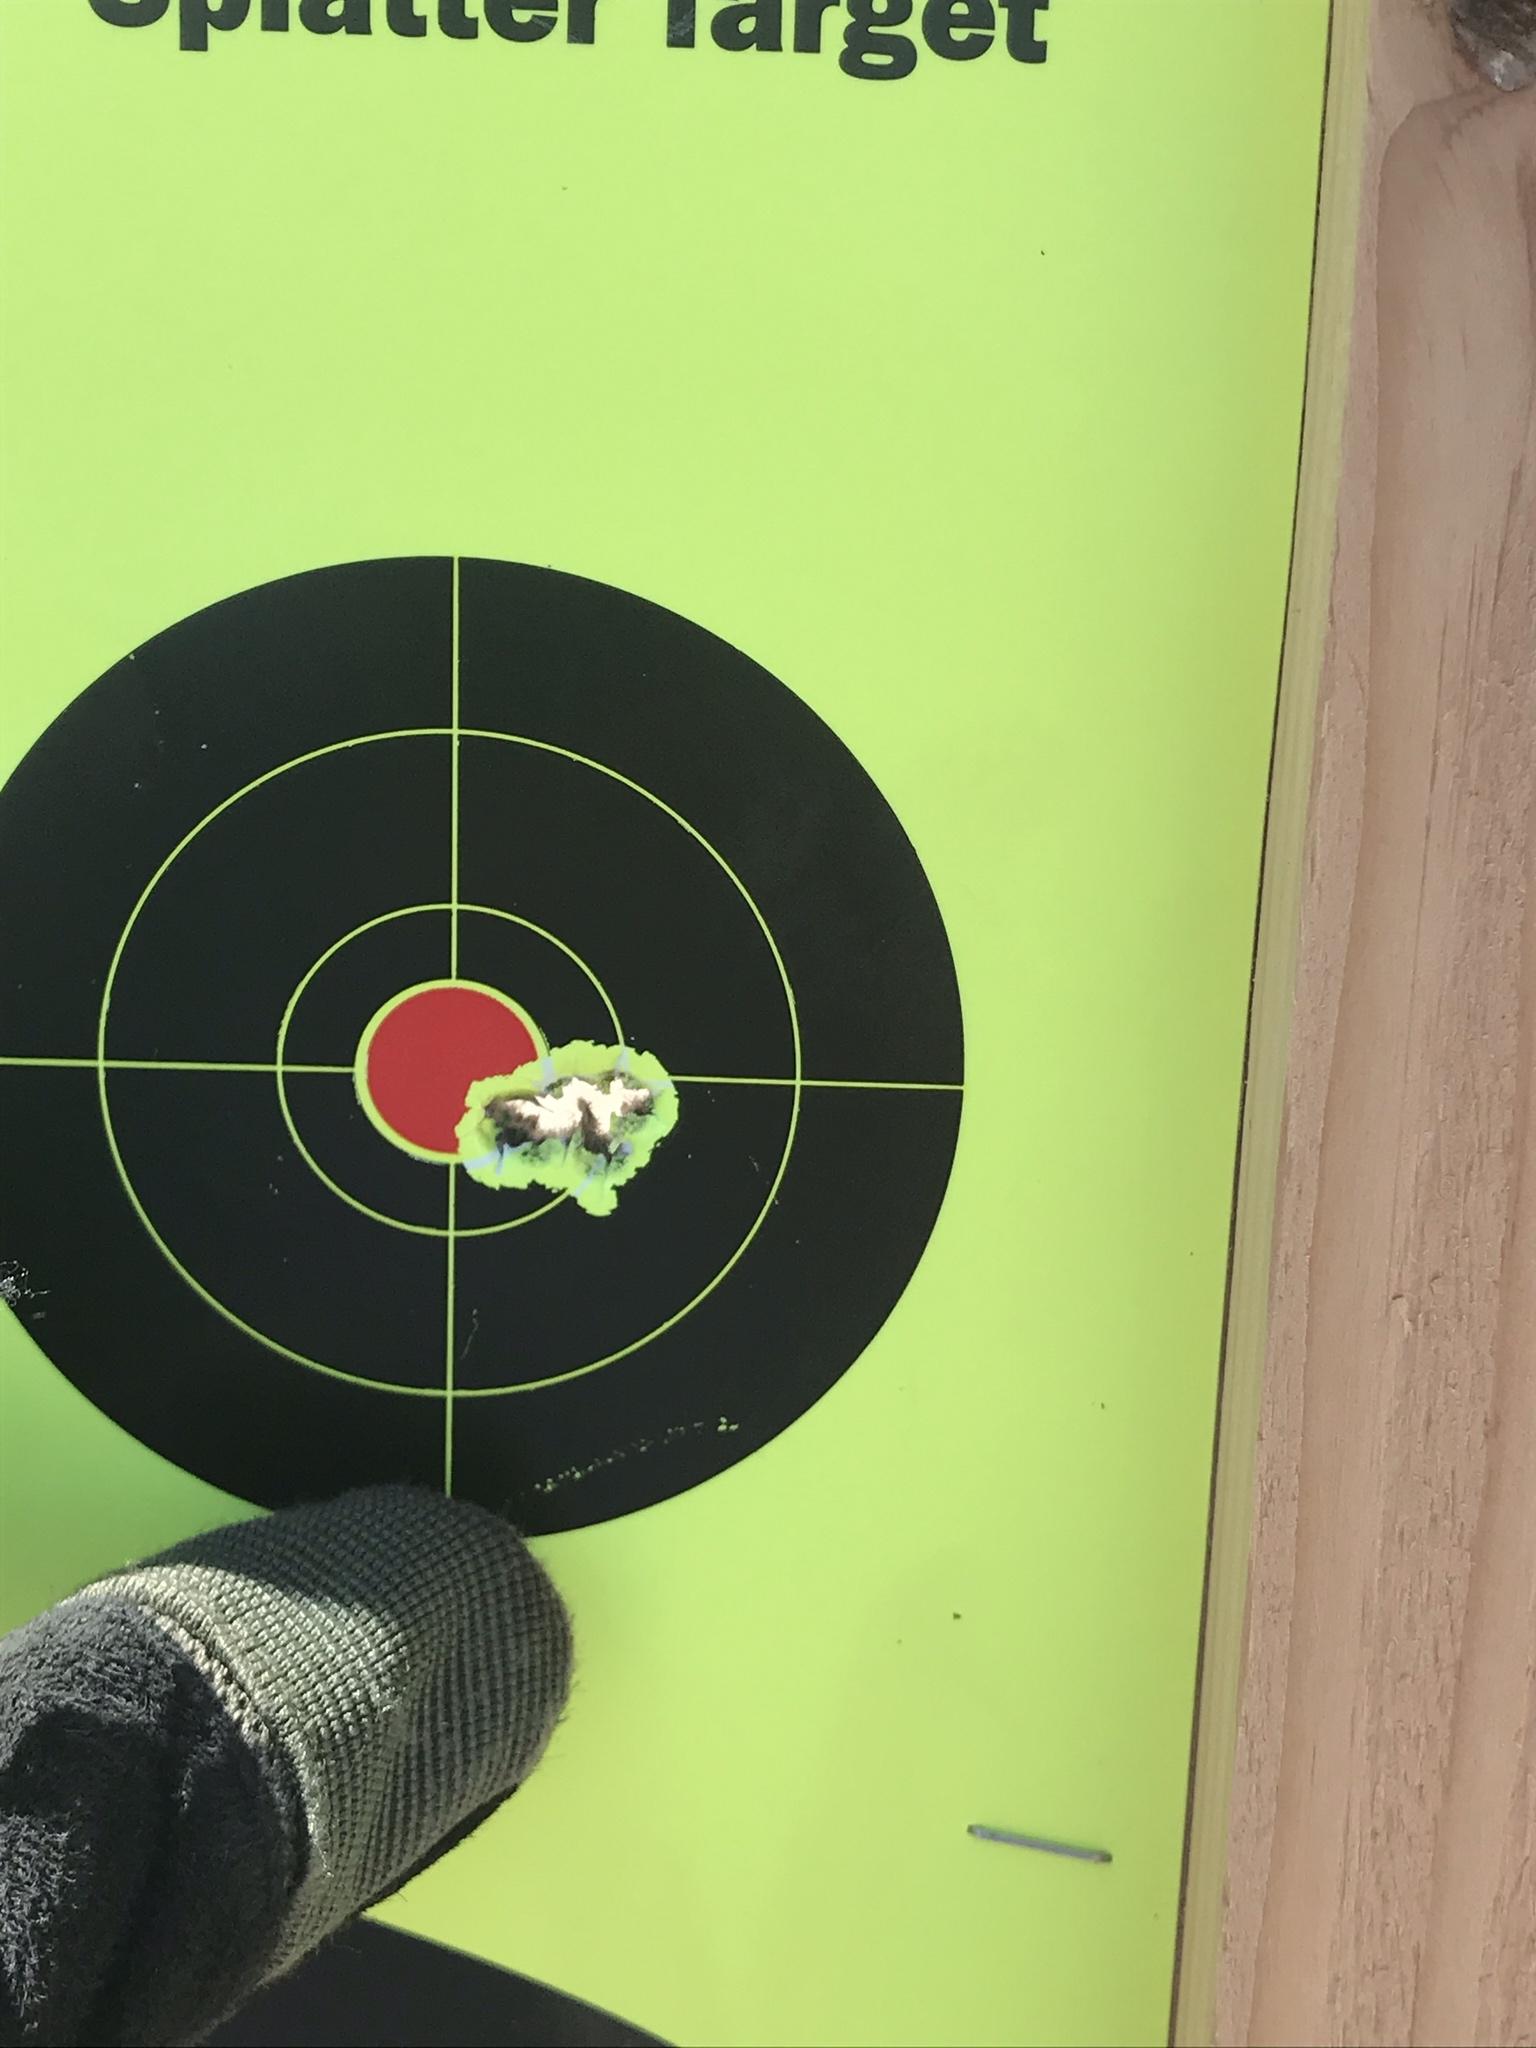 List of HK416/MR556/MR223 compatible trigger groups-w5zg0cy.jpg